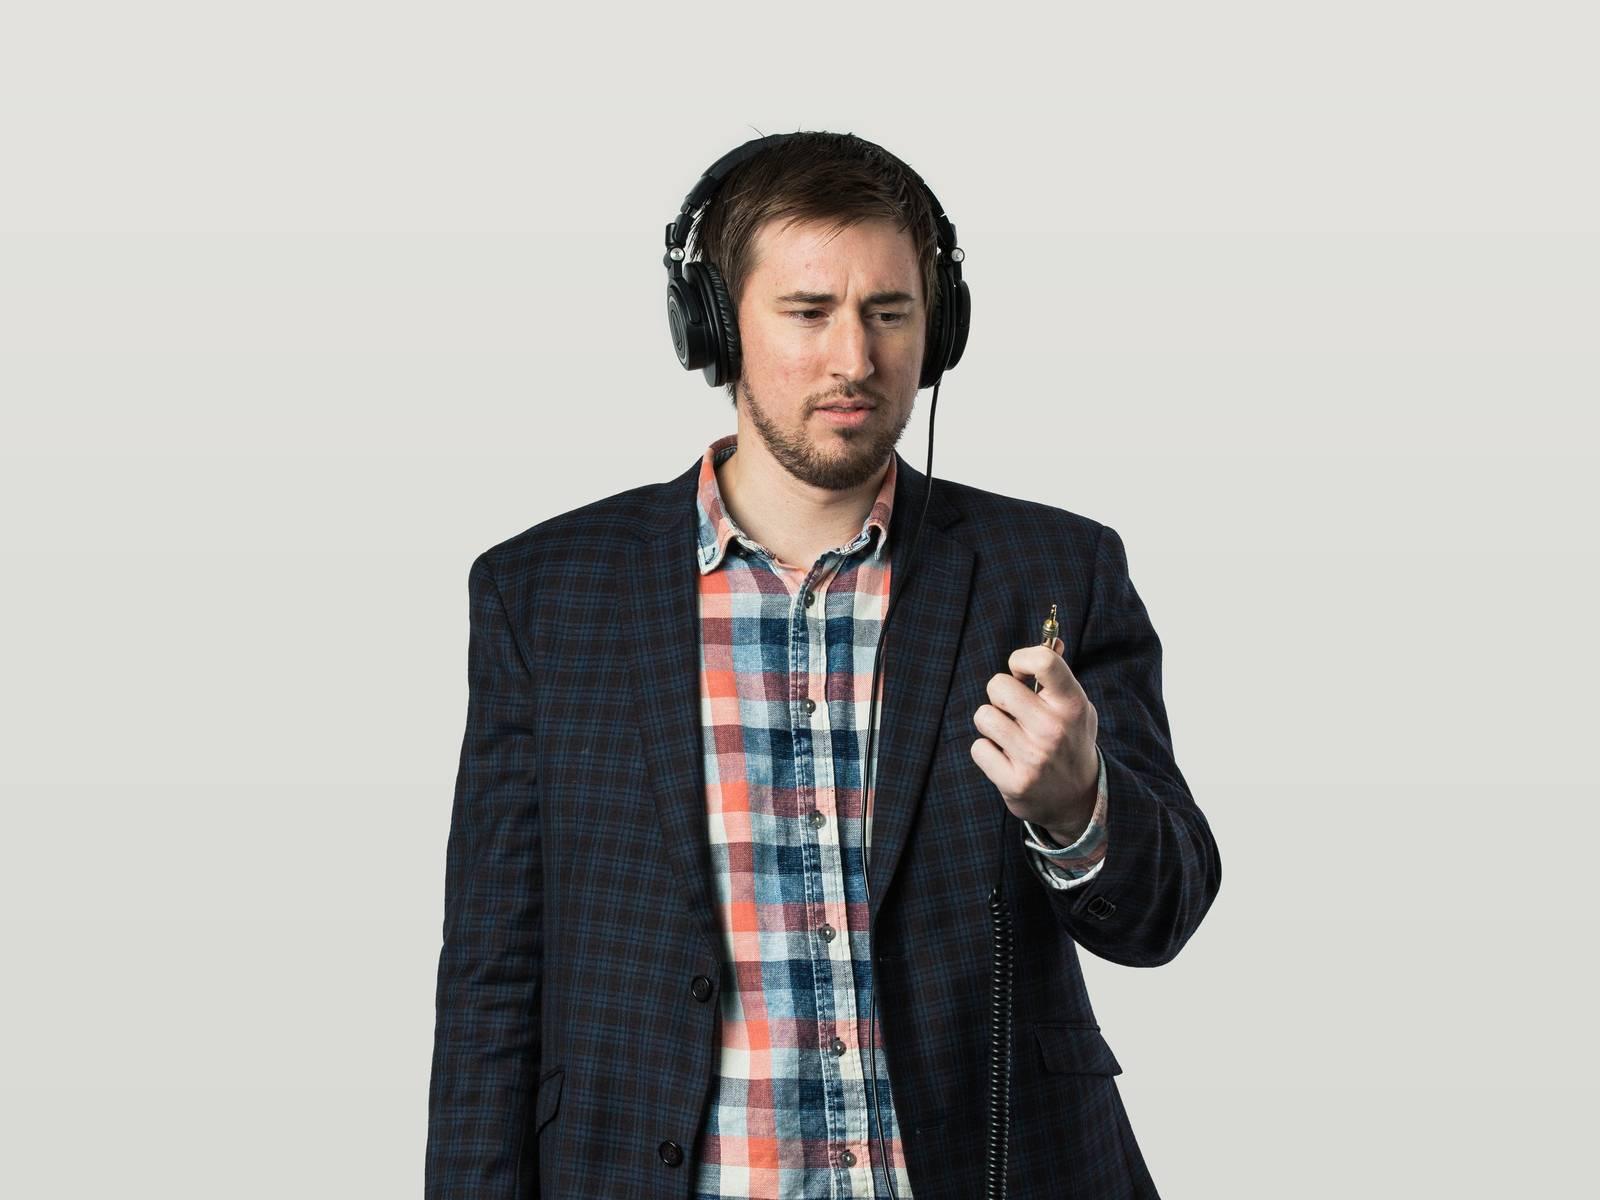 Tommy wearing headphones